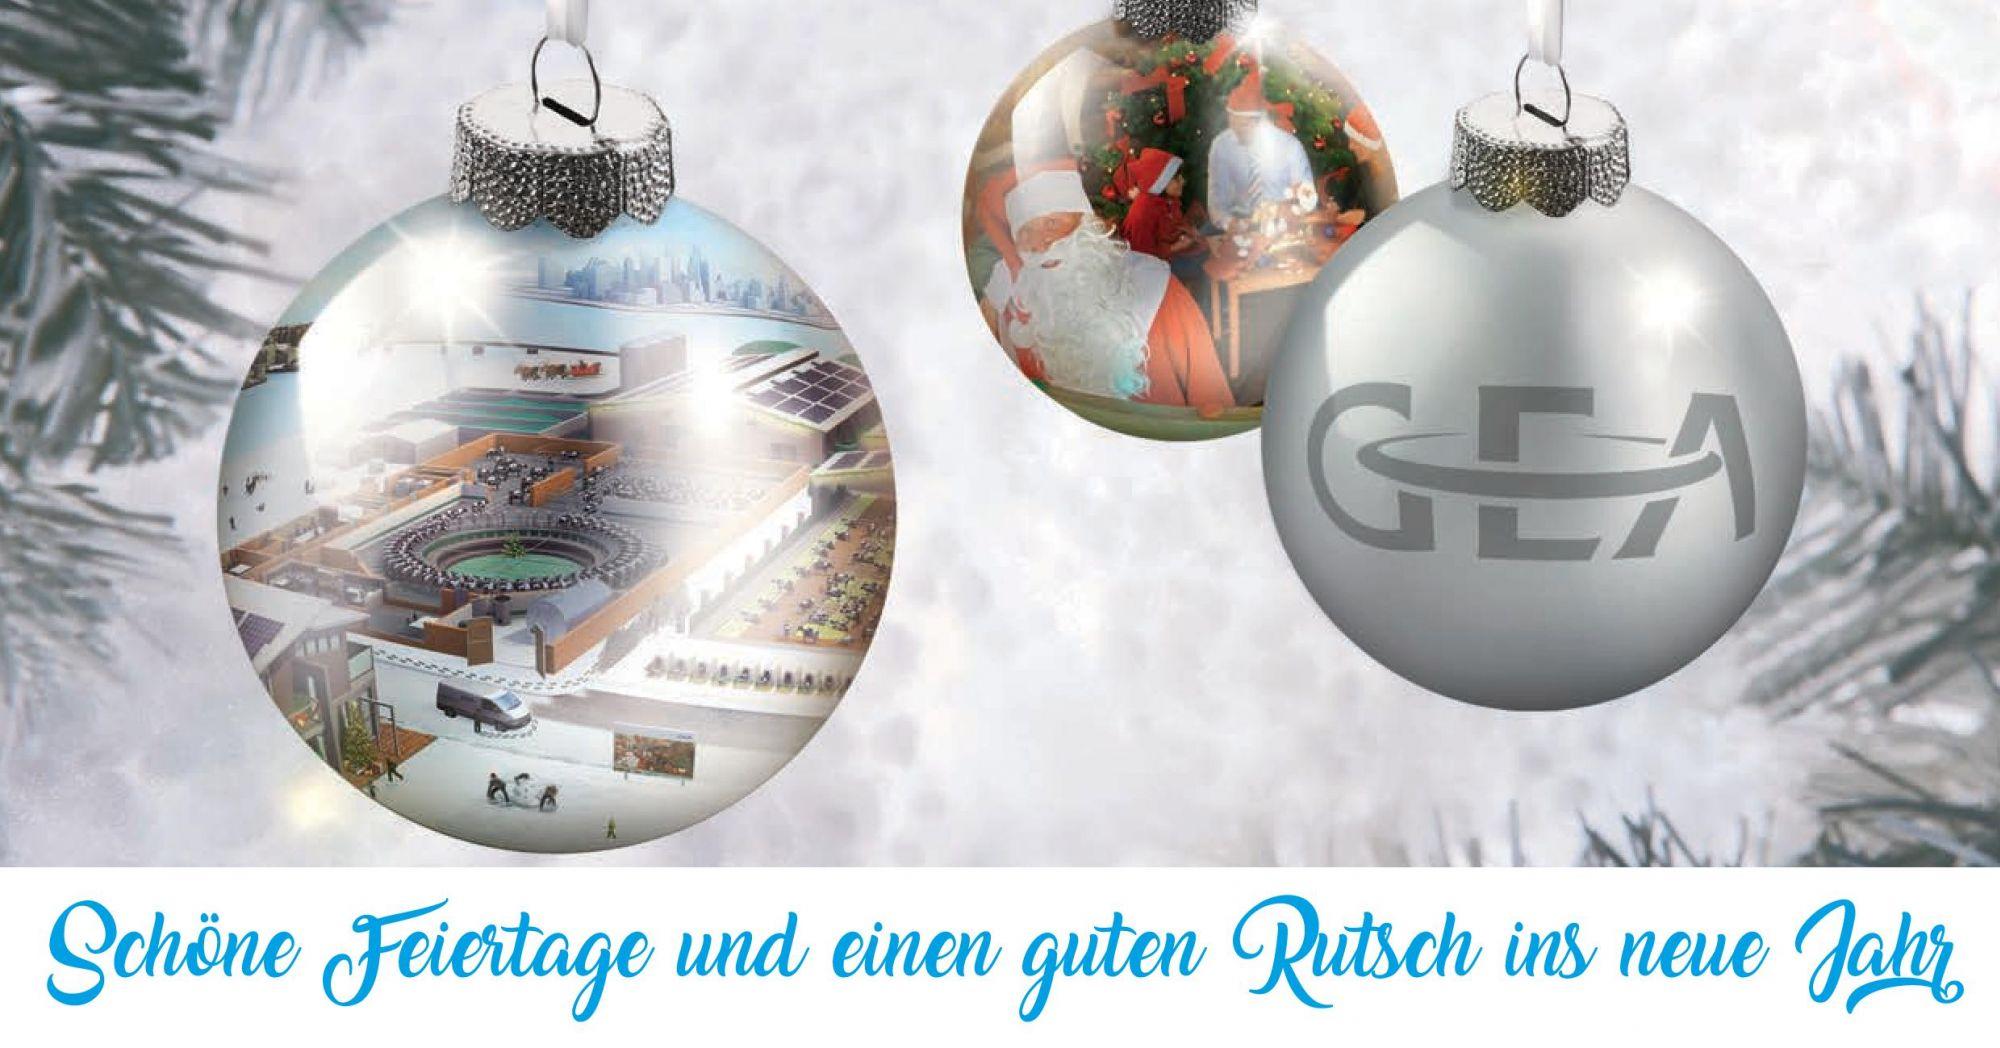 Weihnachtswünsche An Den Partner.Weihnachtsgrüße Moser Land Und Fahrzeugtechnik Hohenfels